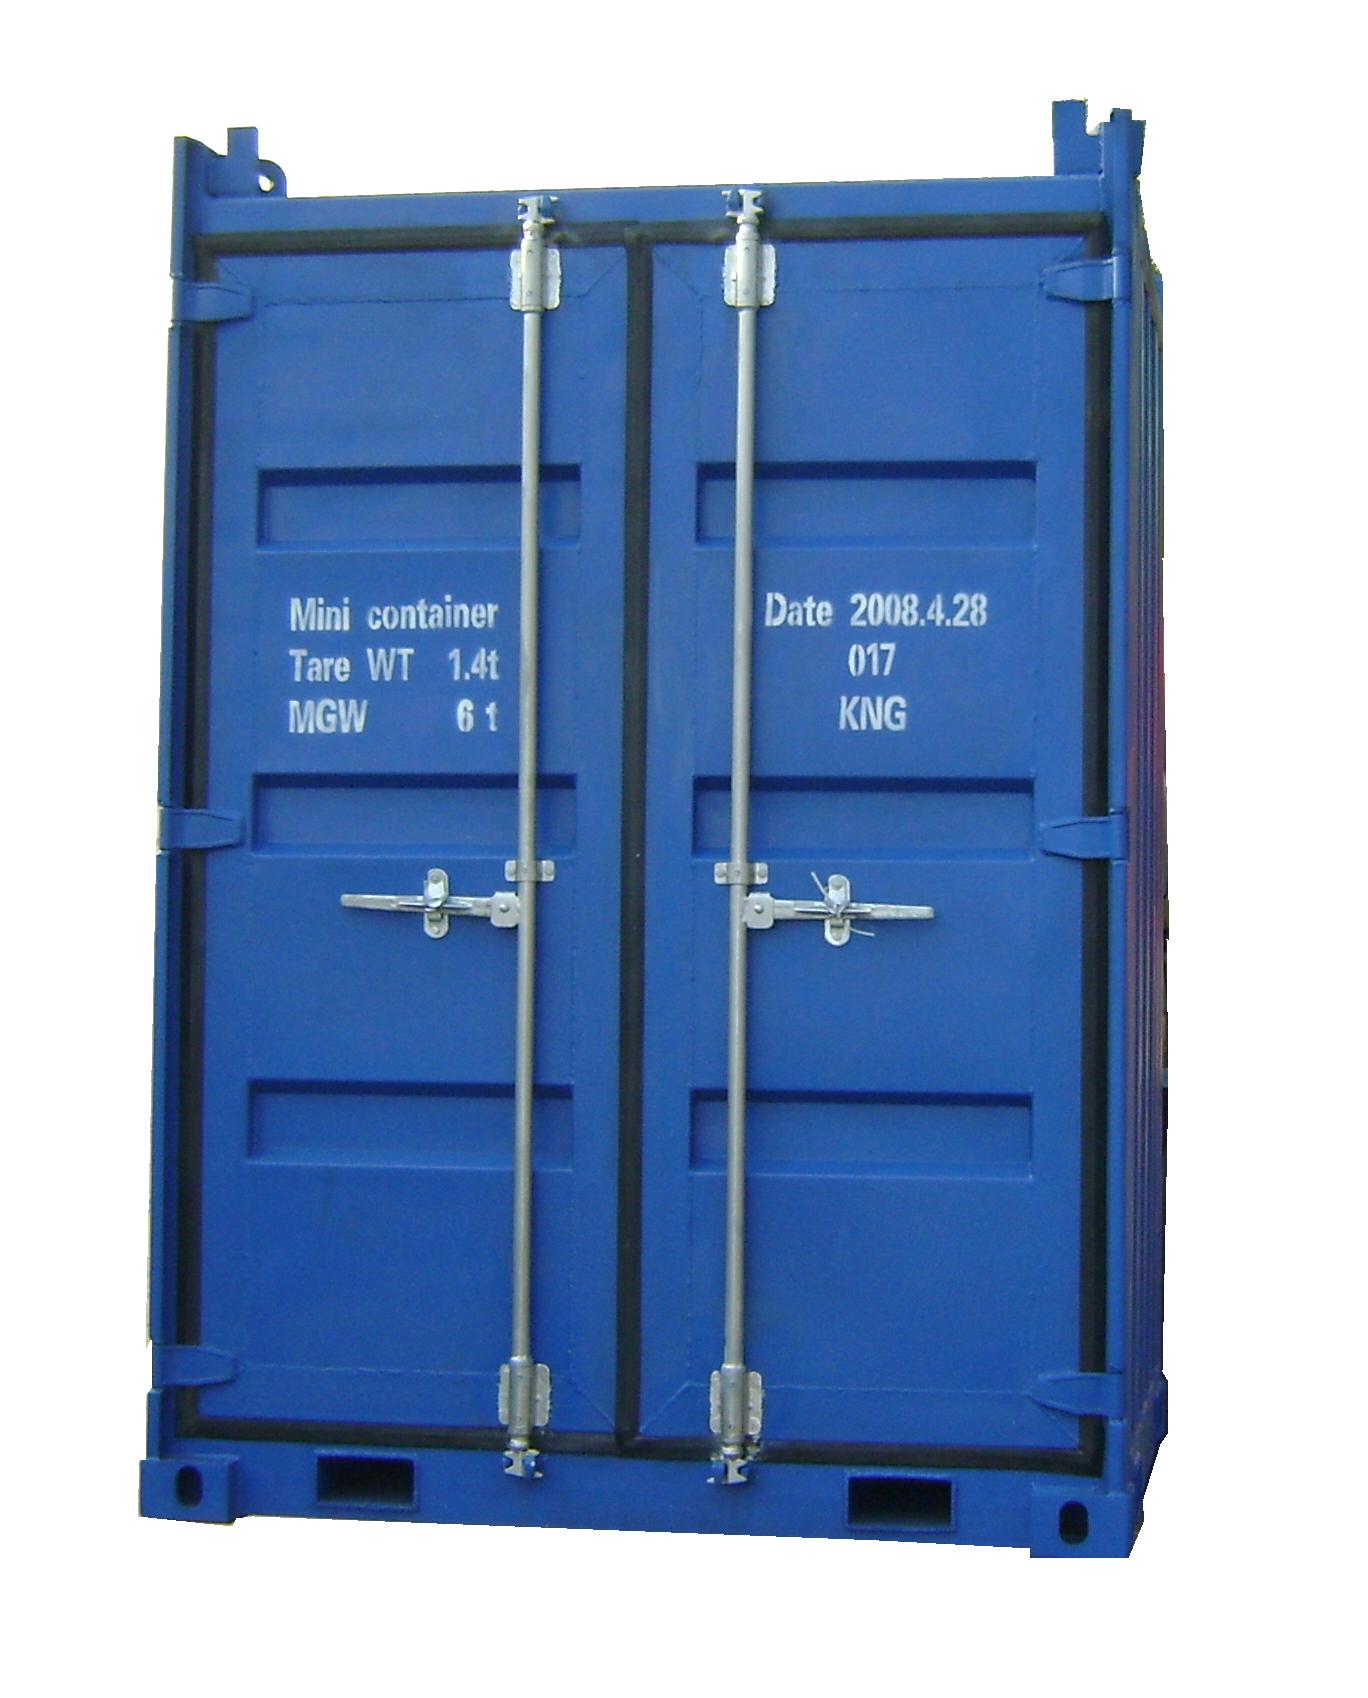 6'X6'X9' Mini Offshore Container (Option:Shelf)